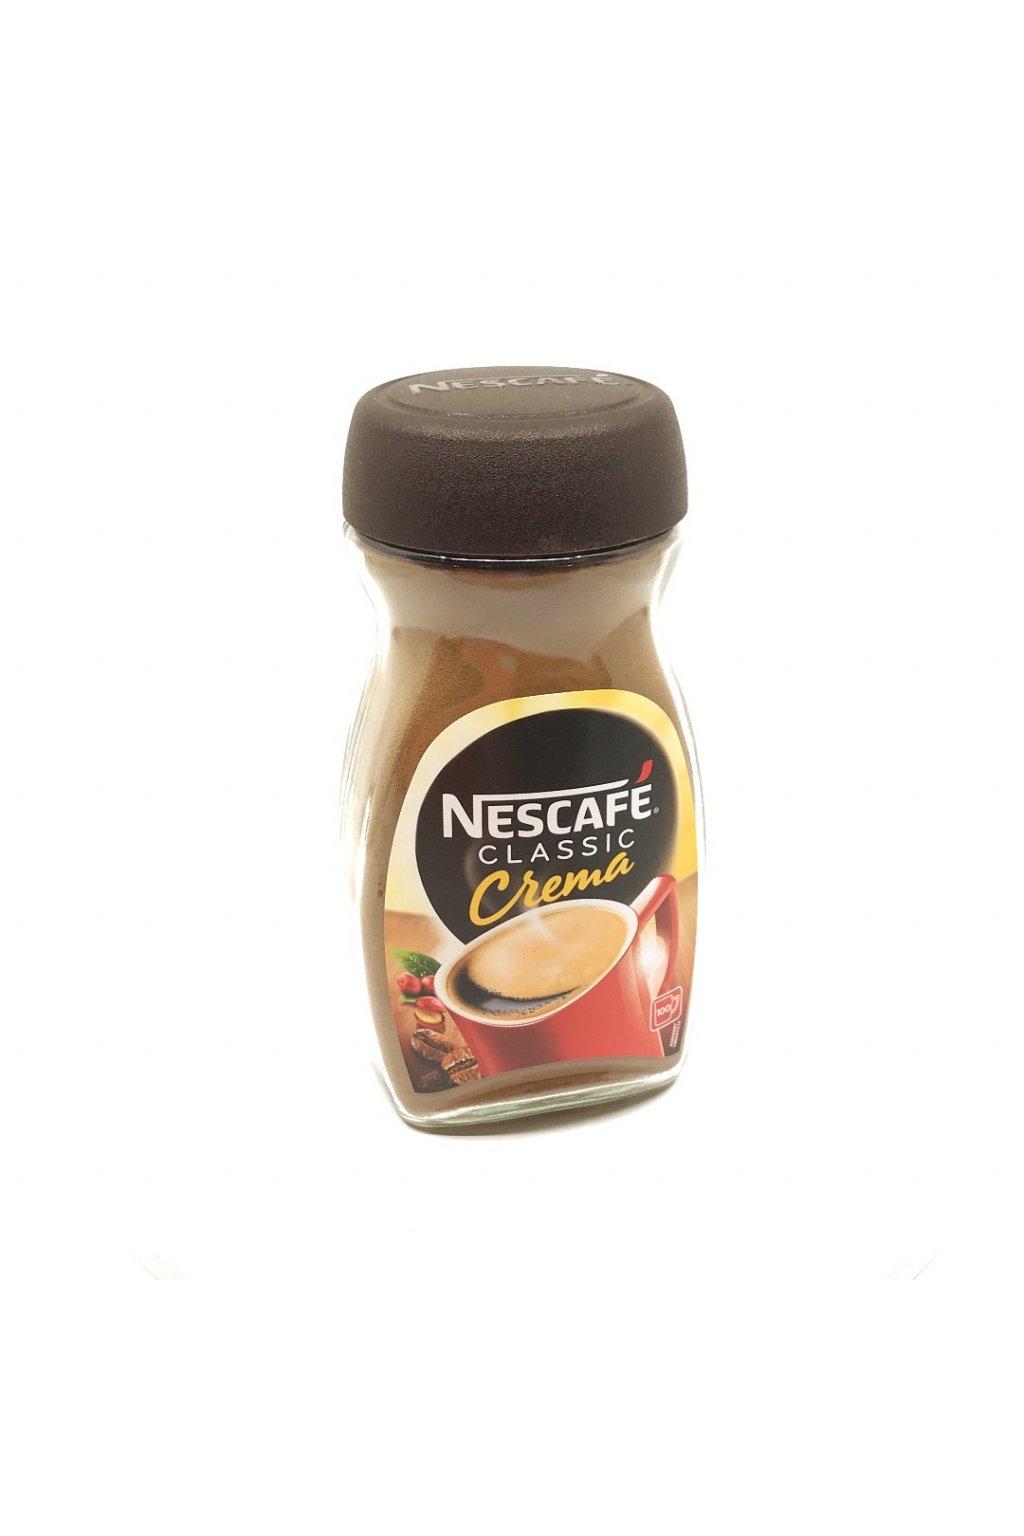 Nescafé Classic Crema, 200 g